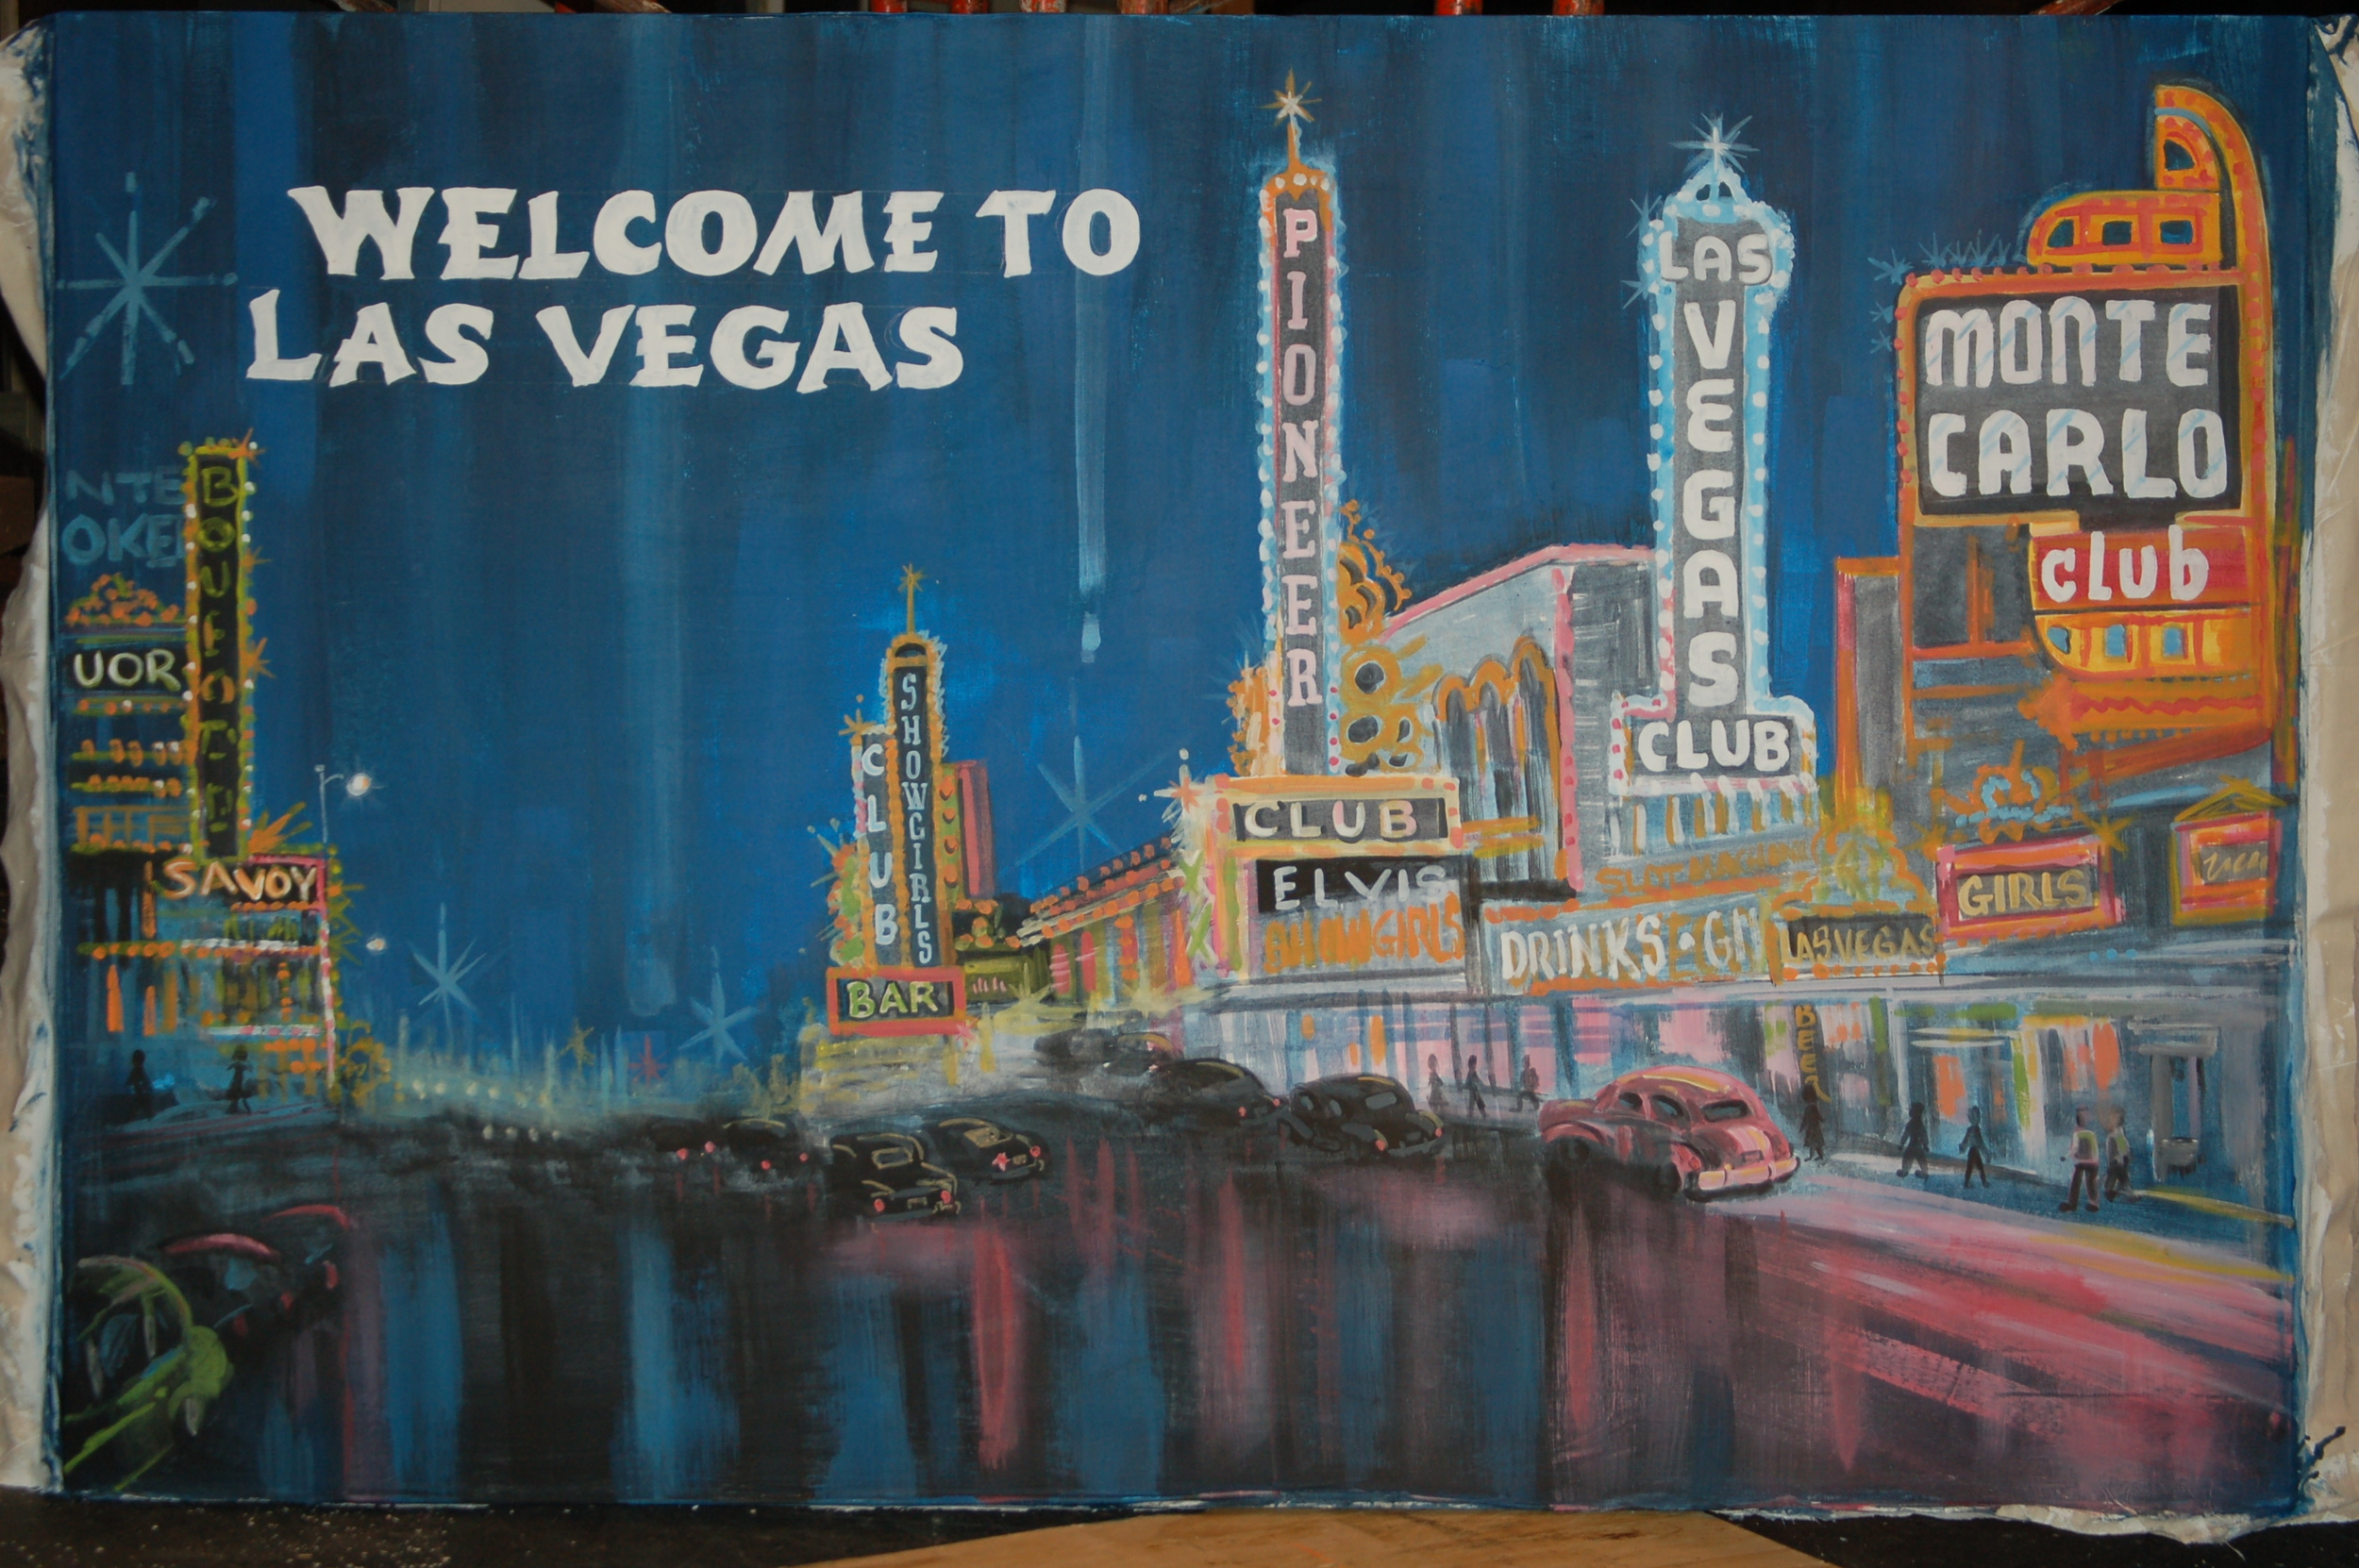 Vegas_0299.JPG